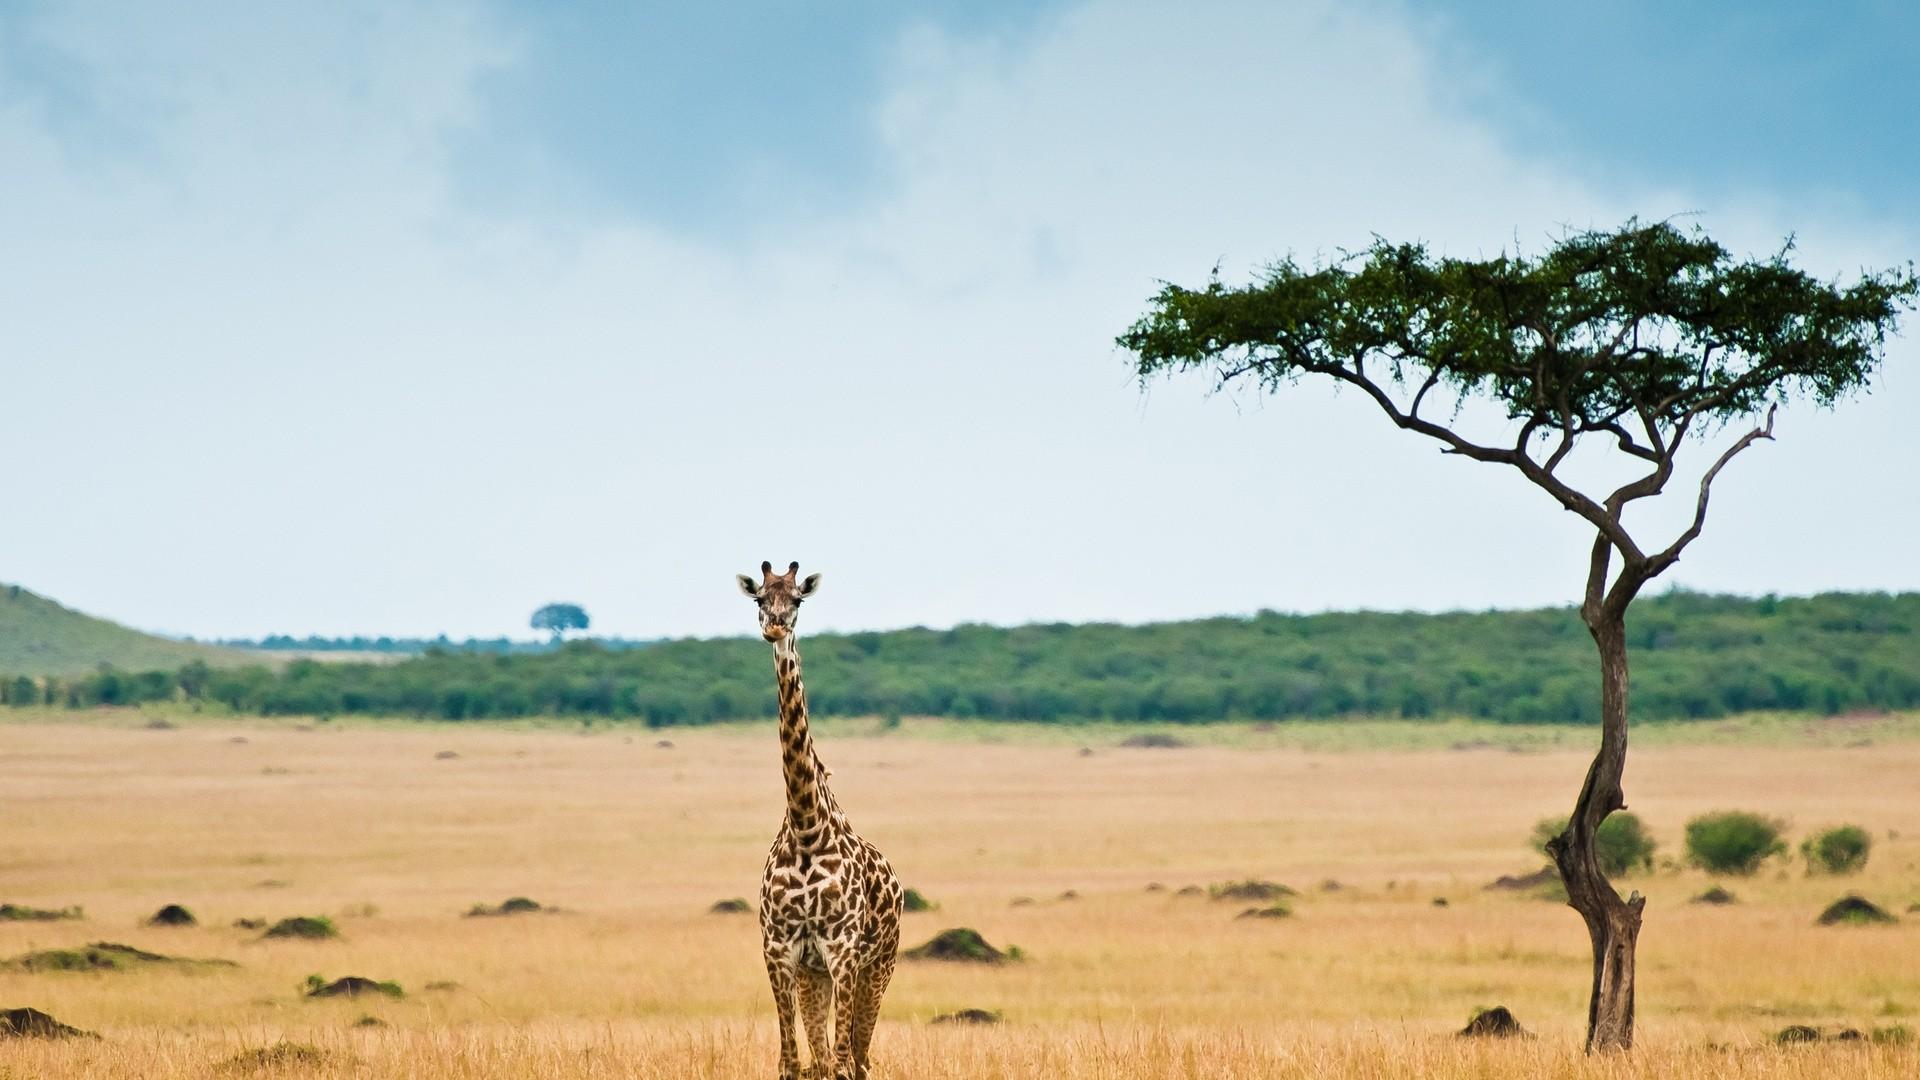 Africa Background Wallpaper